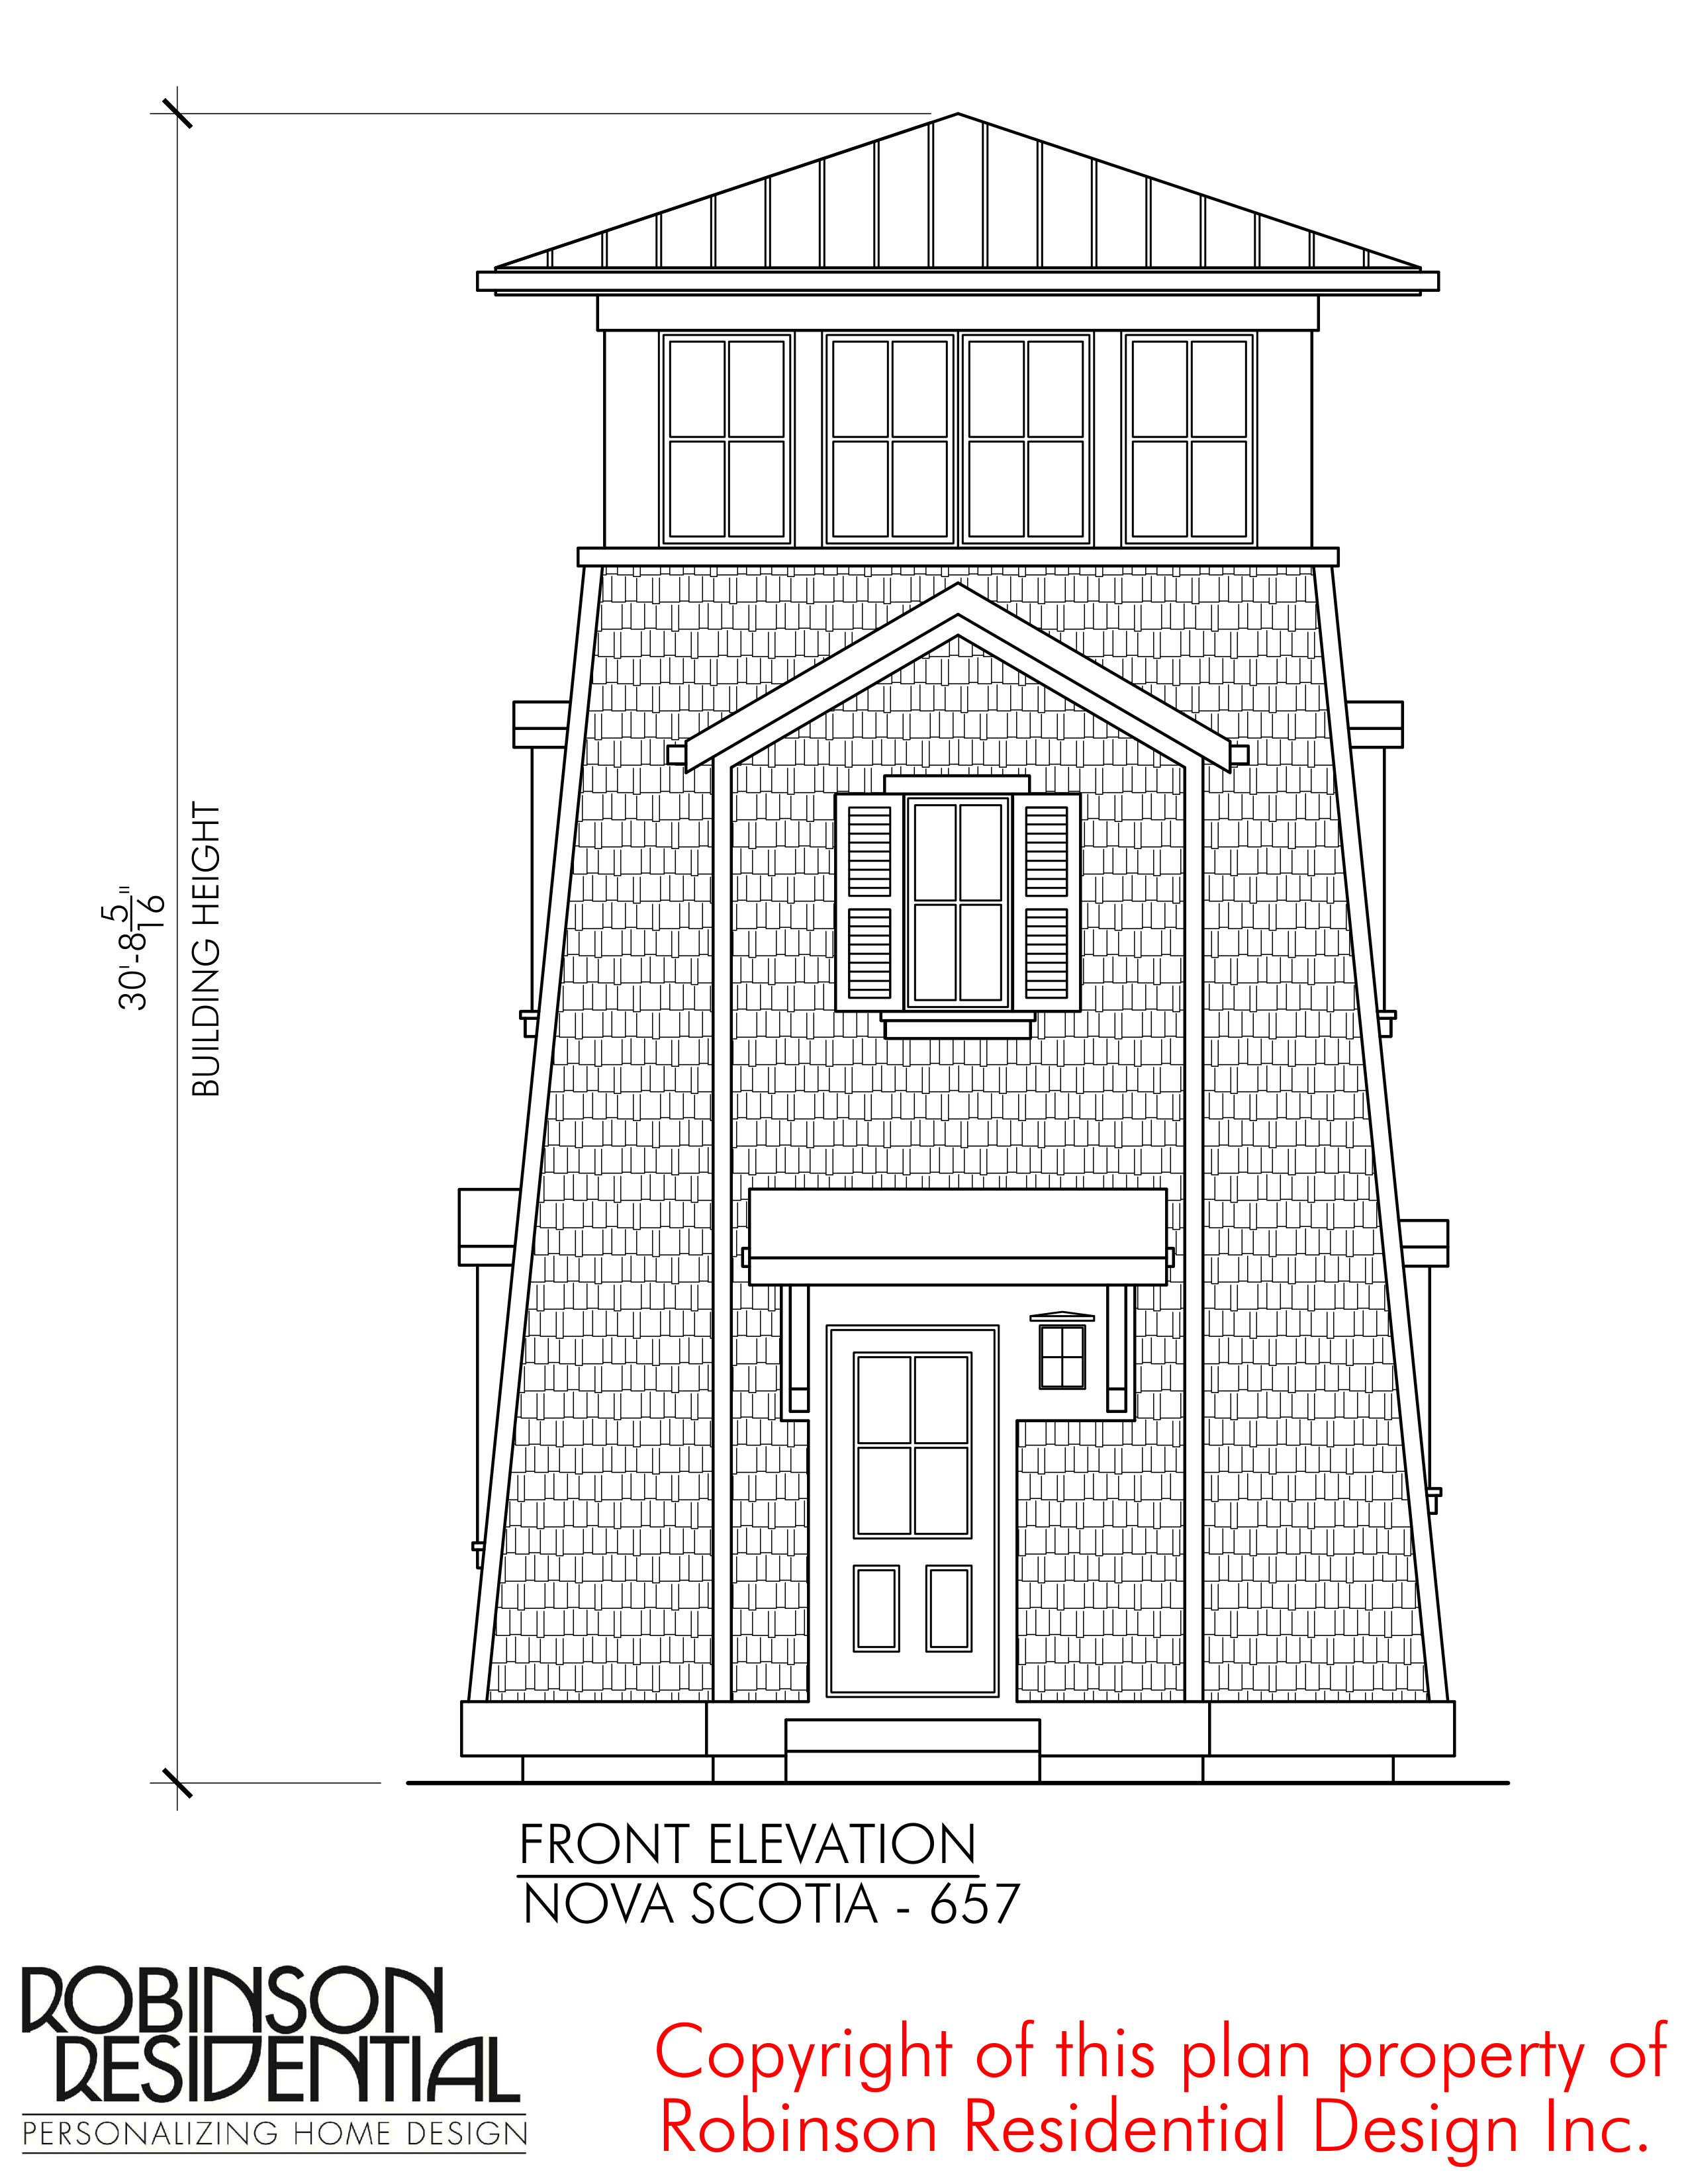 Nova Scotia-657 - Robinson Plans